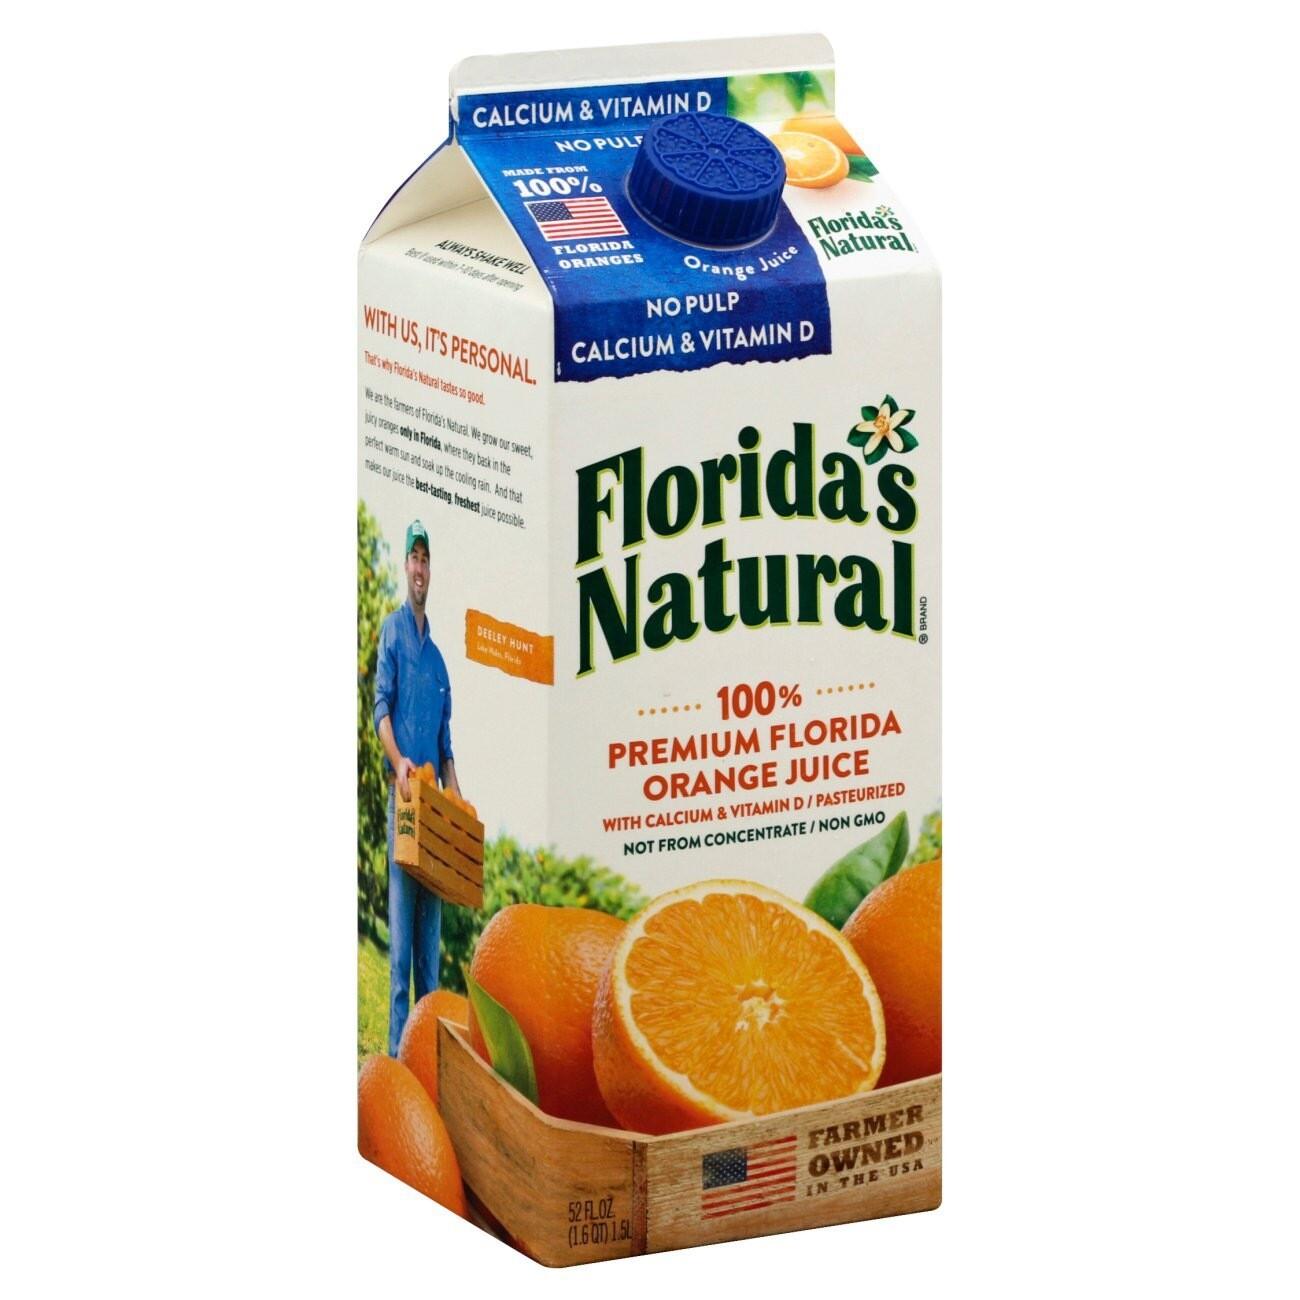 FLORIDAS NATURAL ORANGE JUICE 1.53L